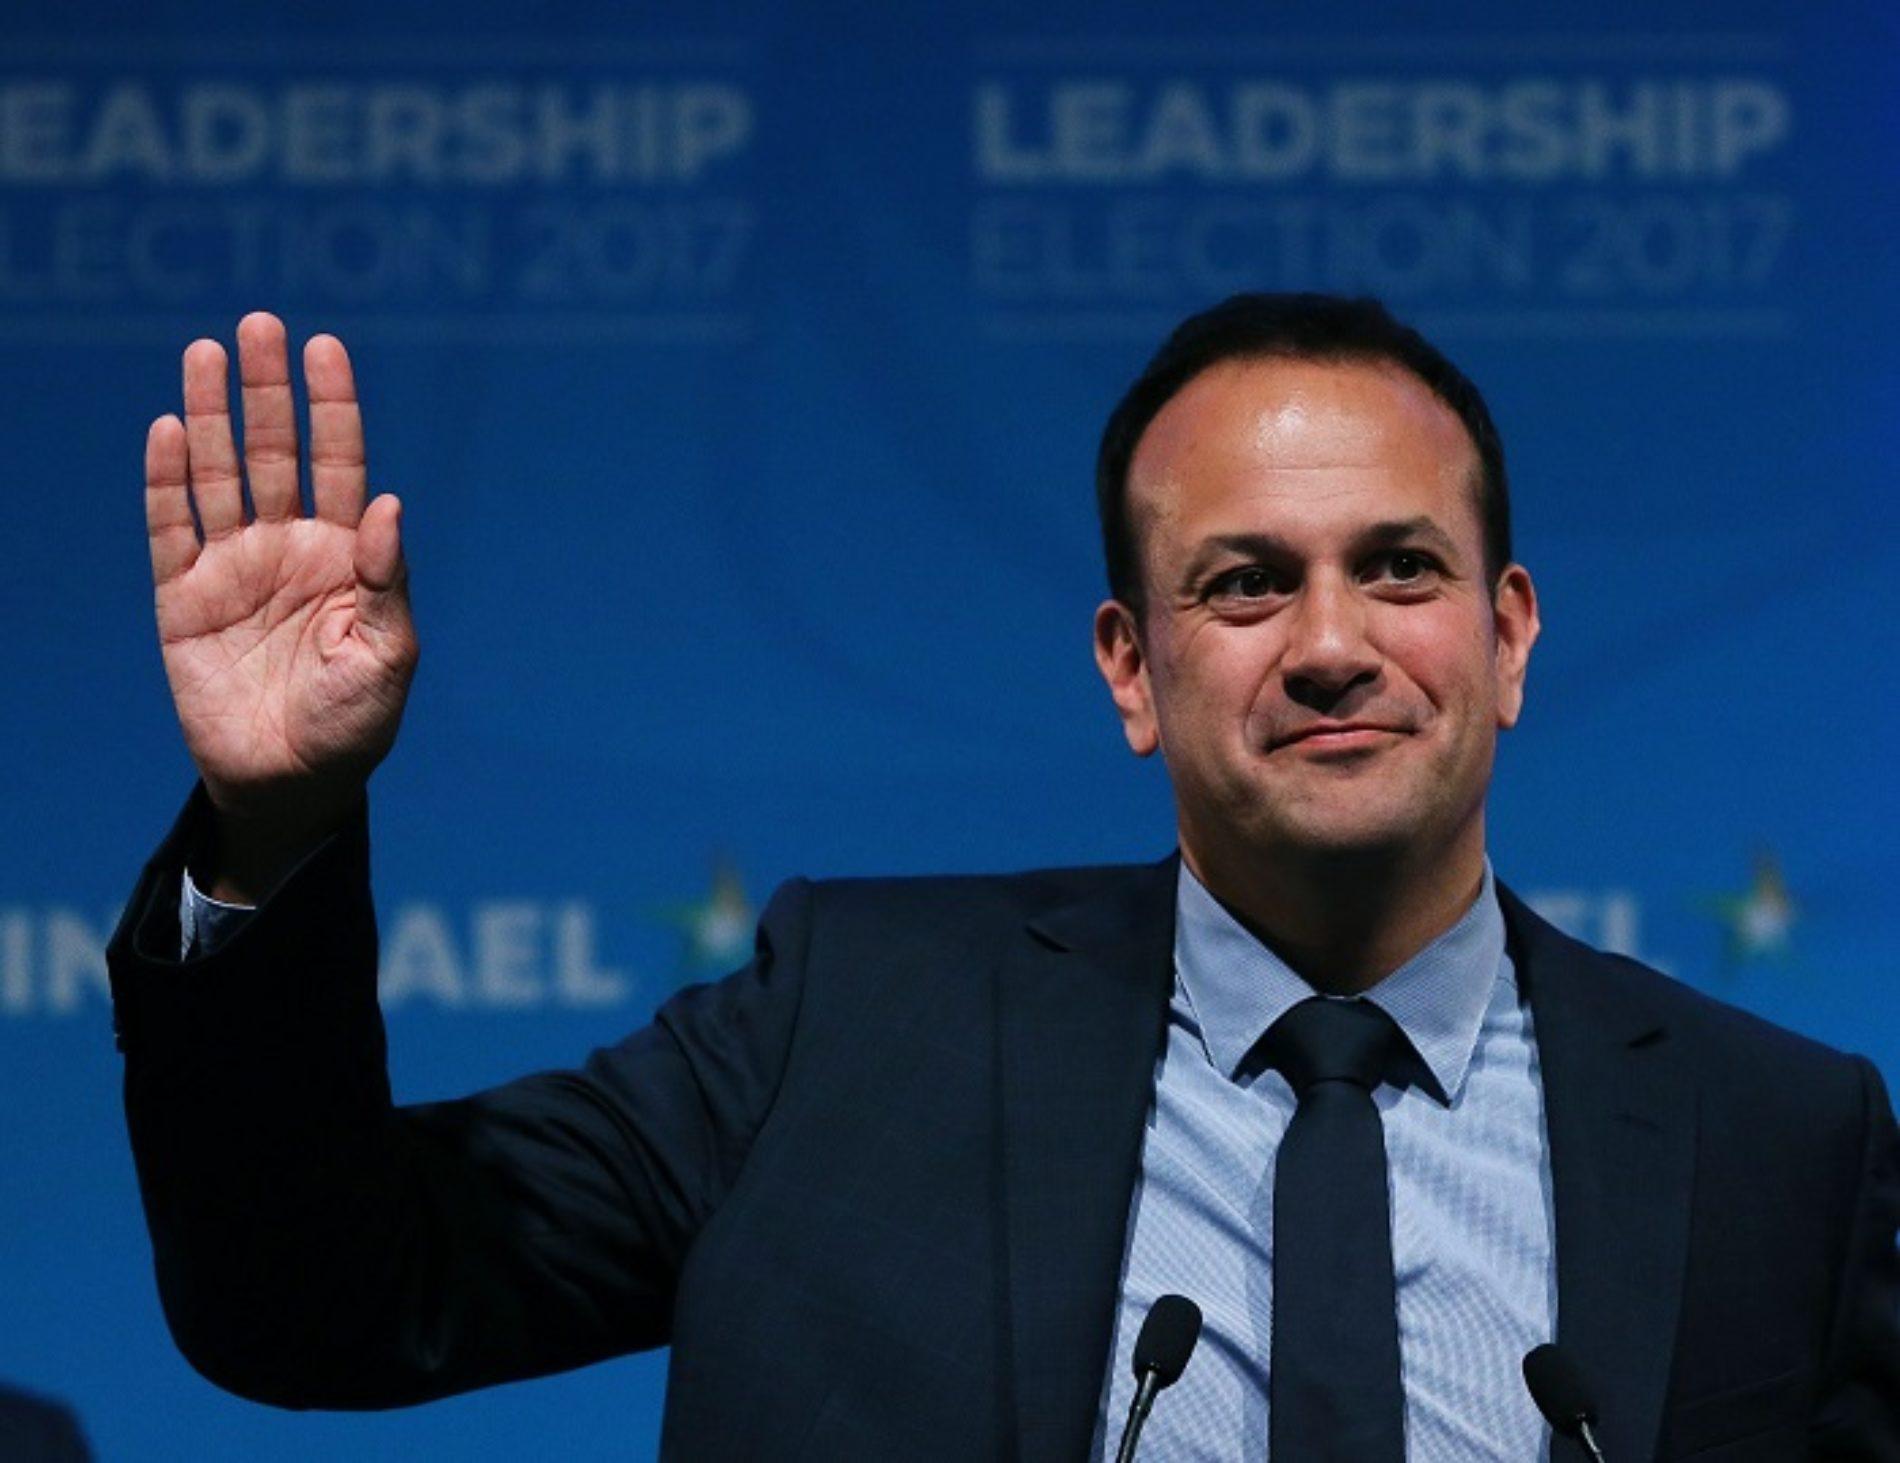 Leo Varadkar, gay son of Indian immigrant, to be next Irish PM